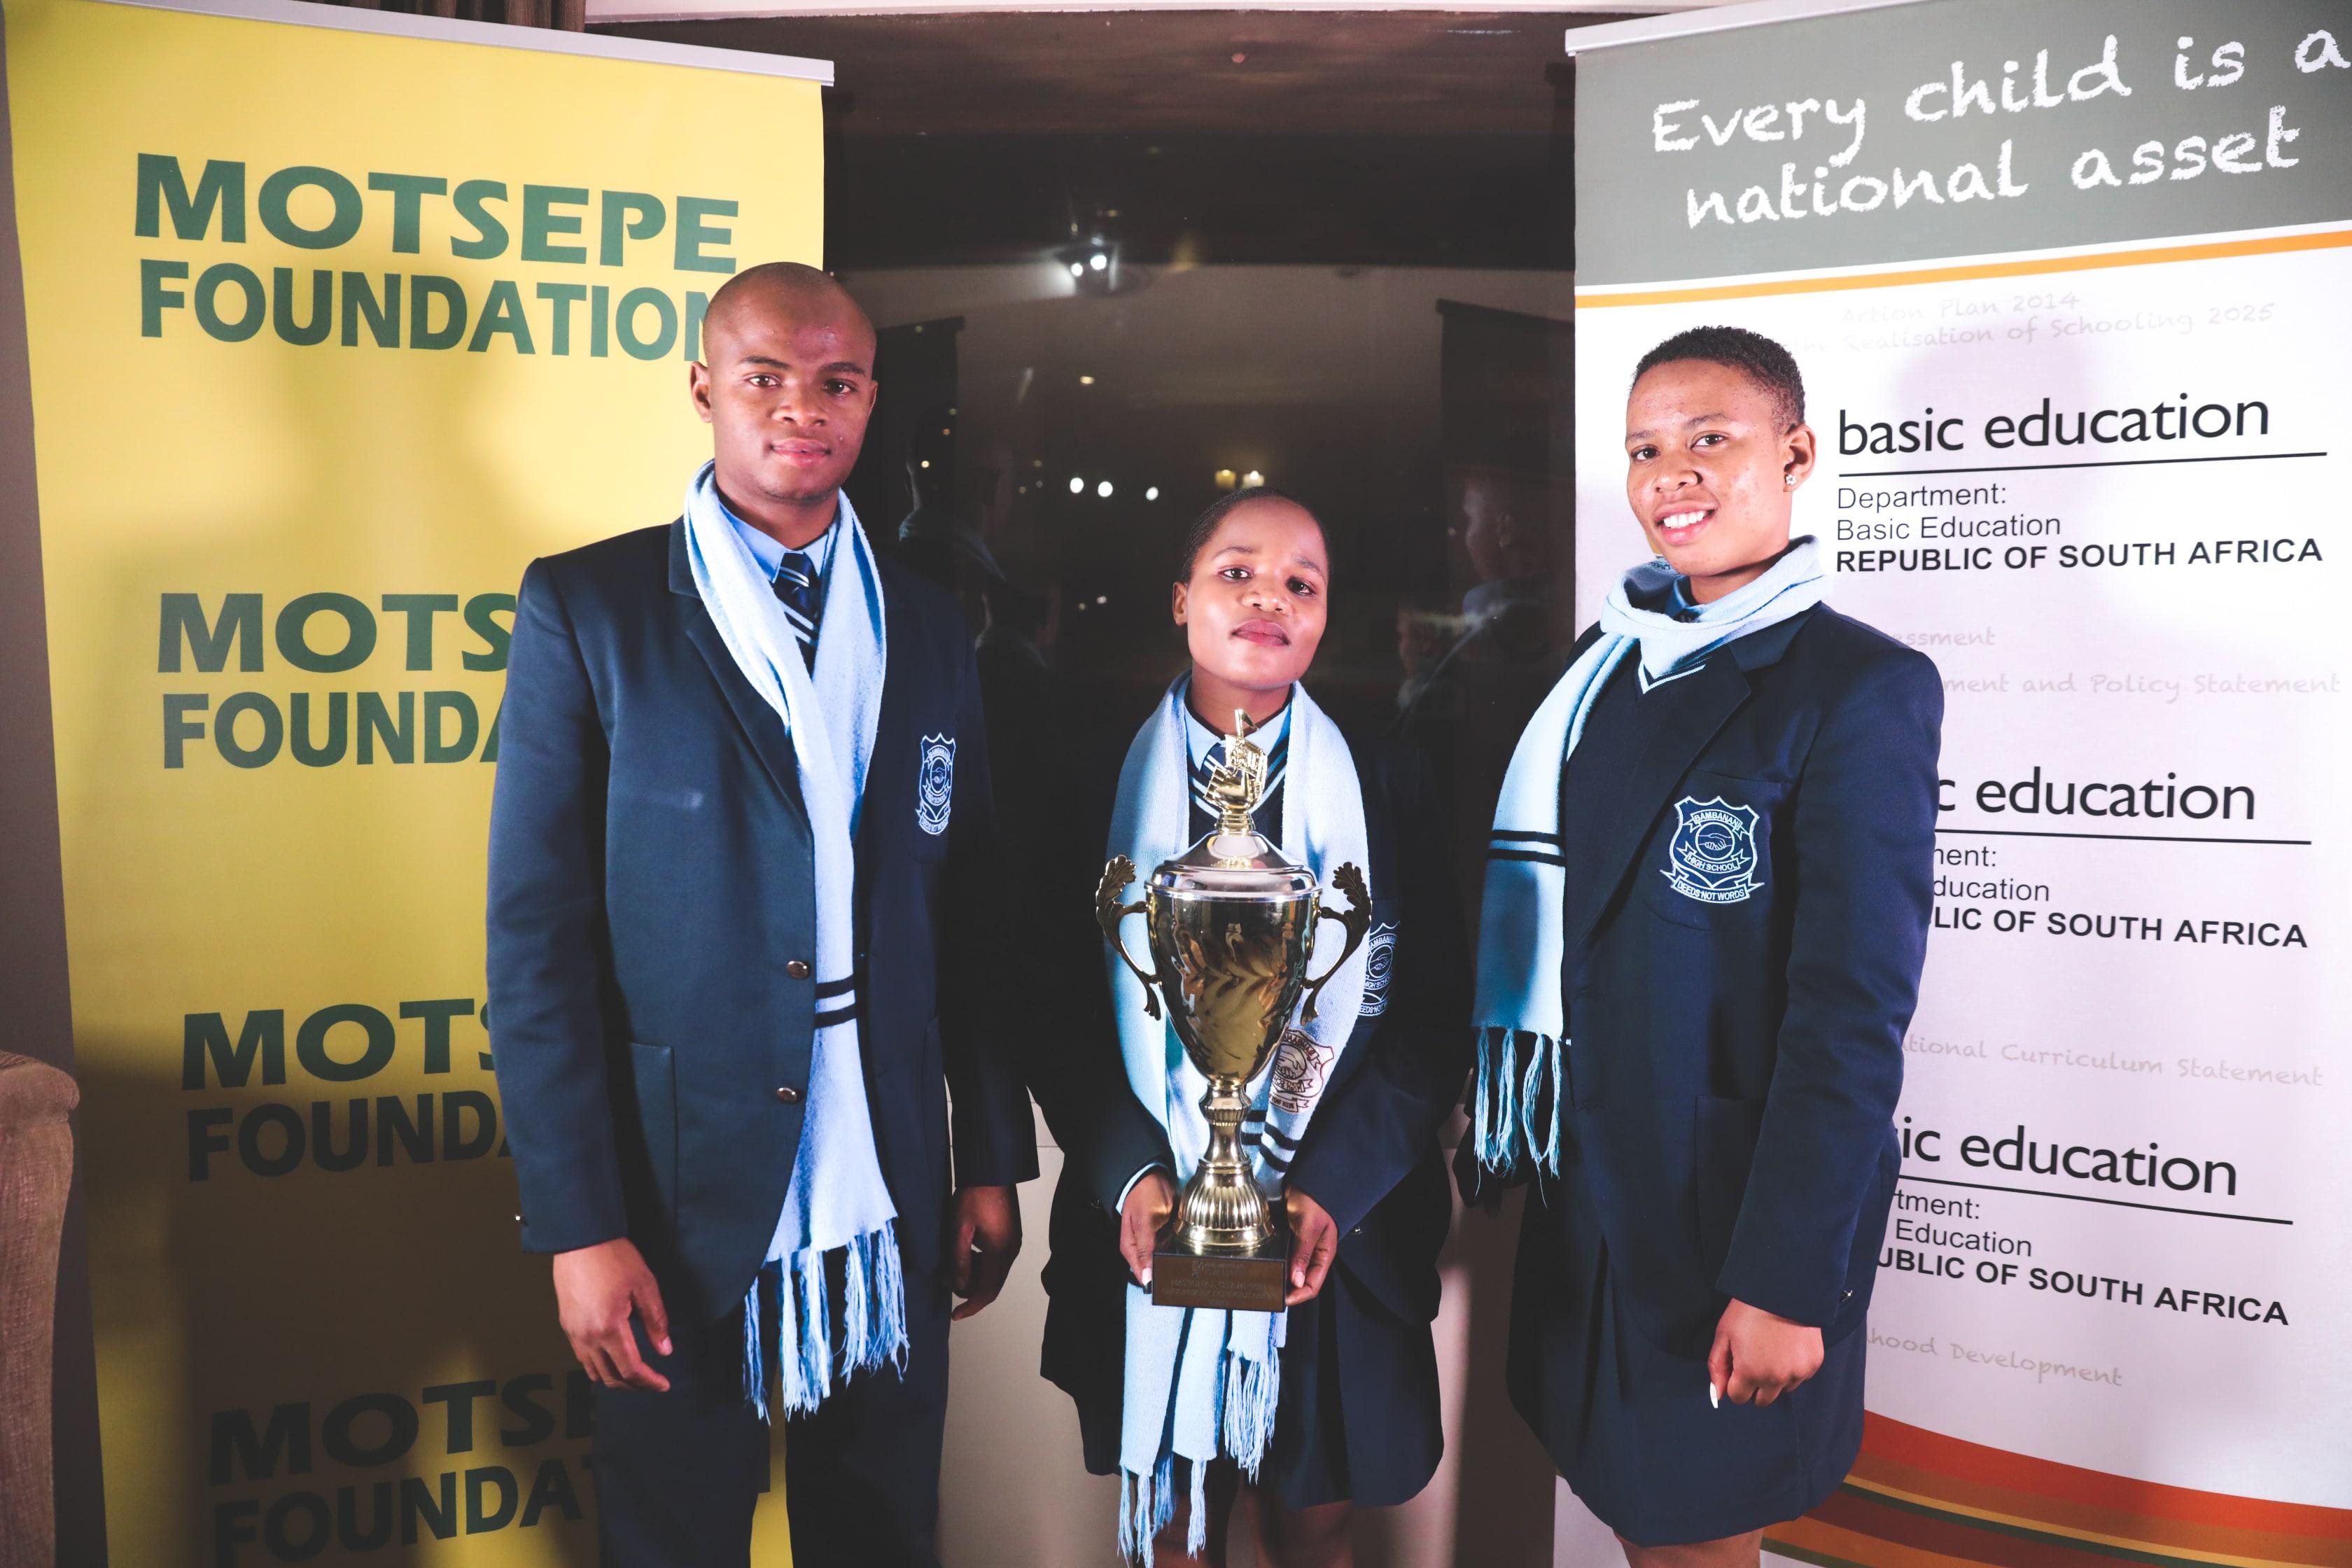 ABC SCHOOLS EISTEDDFOD - Motsepe Foundation